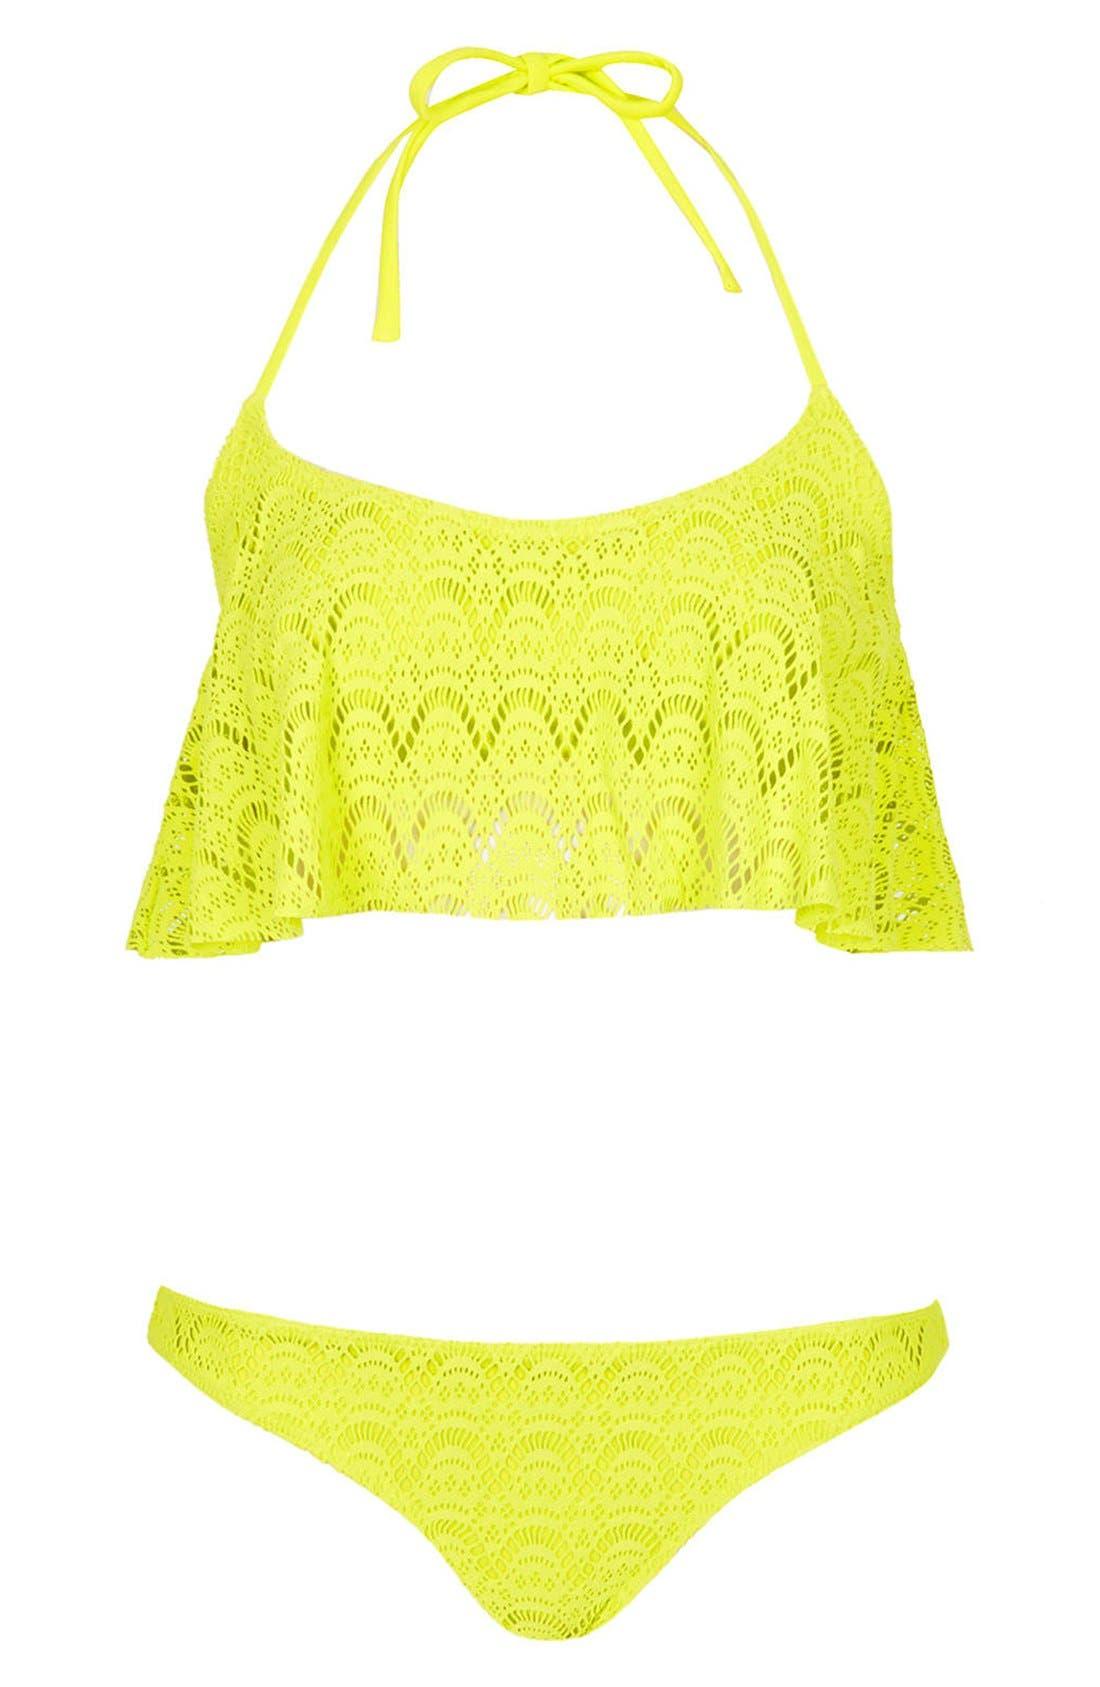 Alternate Image 1 Selected - Topshop Crochet Ruffle Panel Bikini